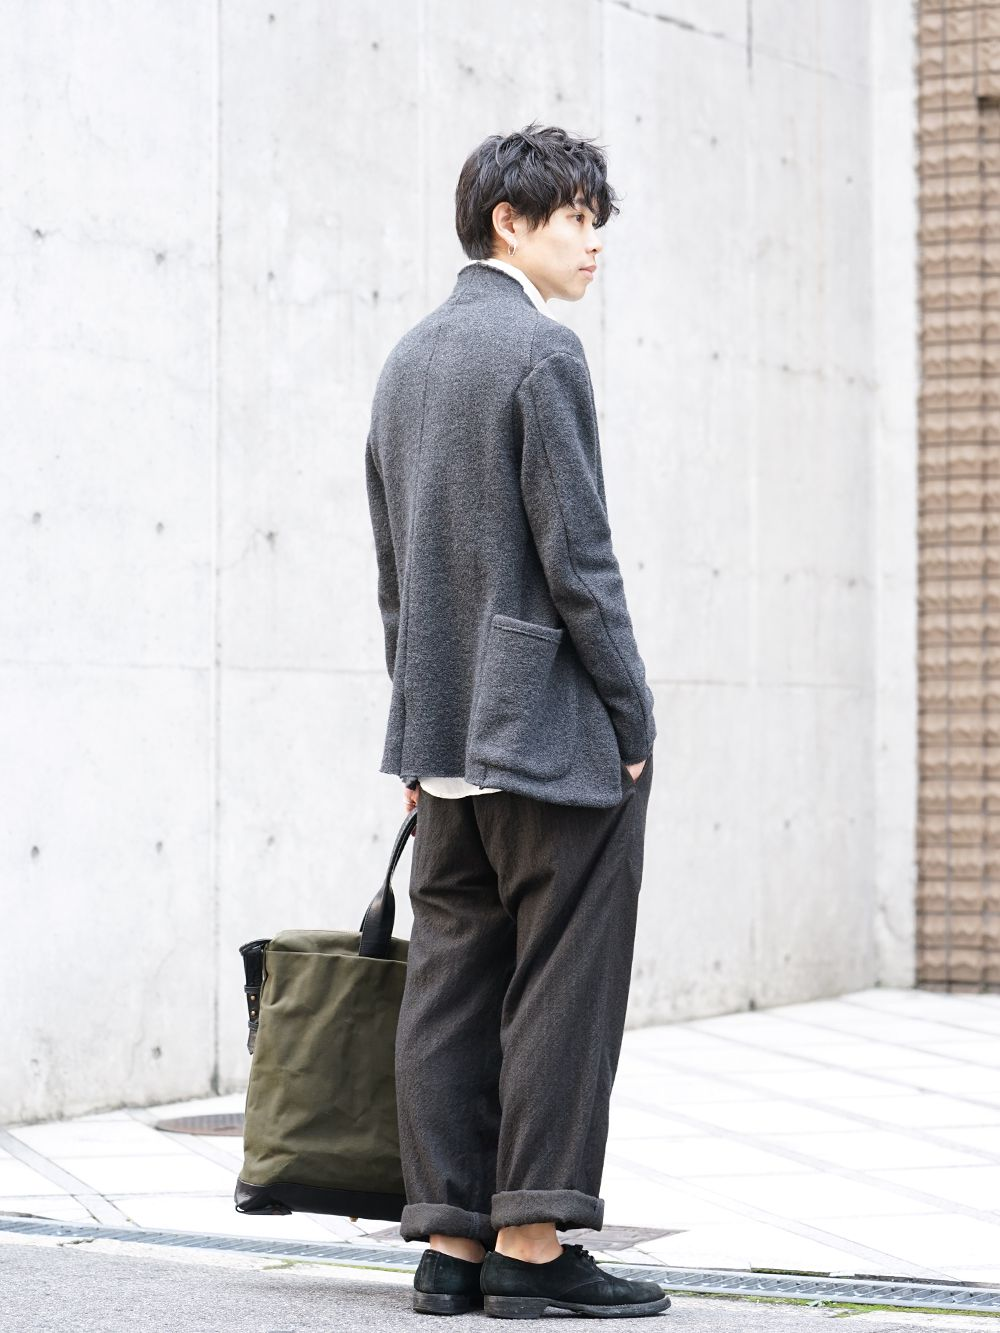 hannibal 19-20AW Autumn Knit Jacket Style - 1-003